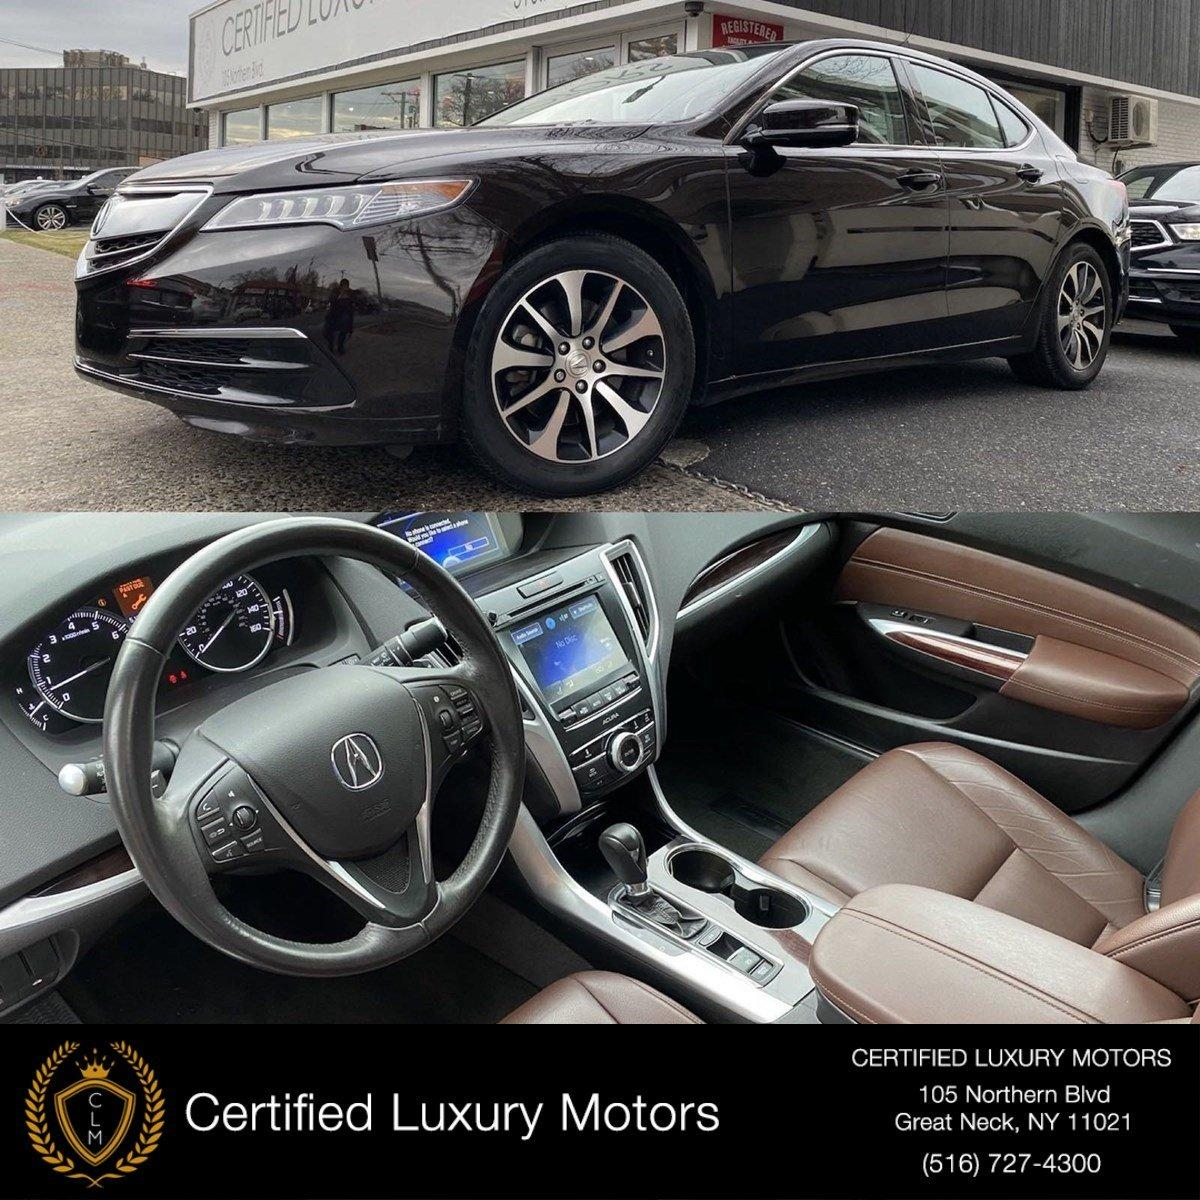 2016 Acura TLX Stock # C0510 For Sale Near Great Neck, NY